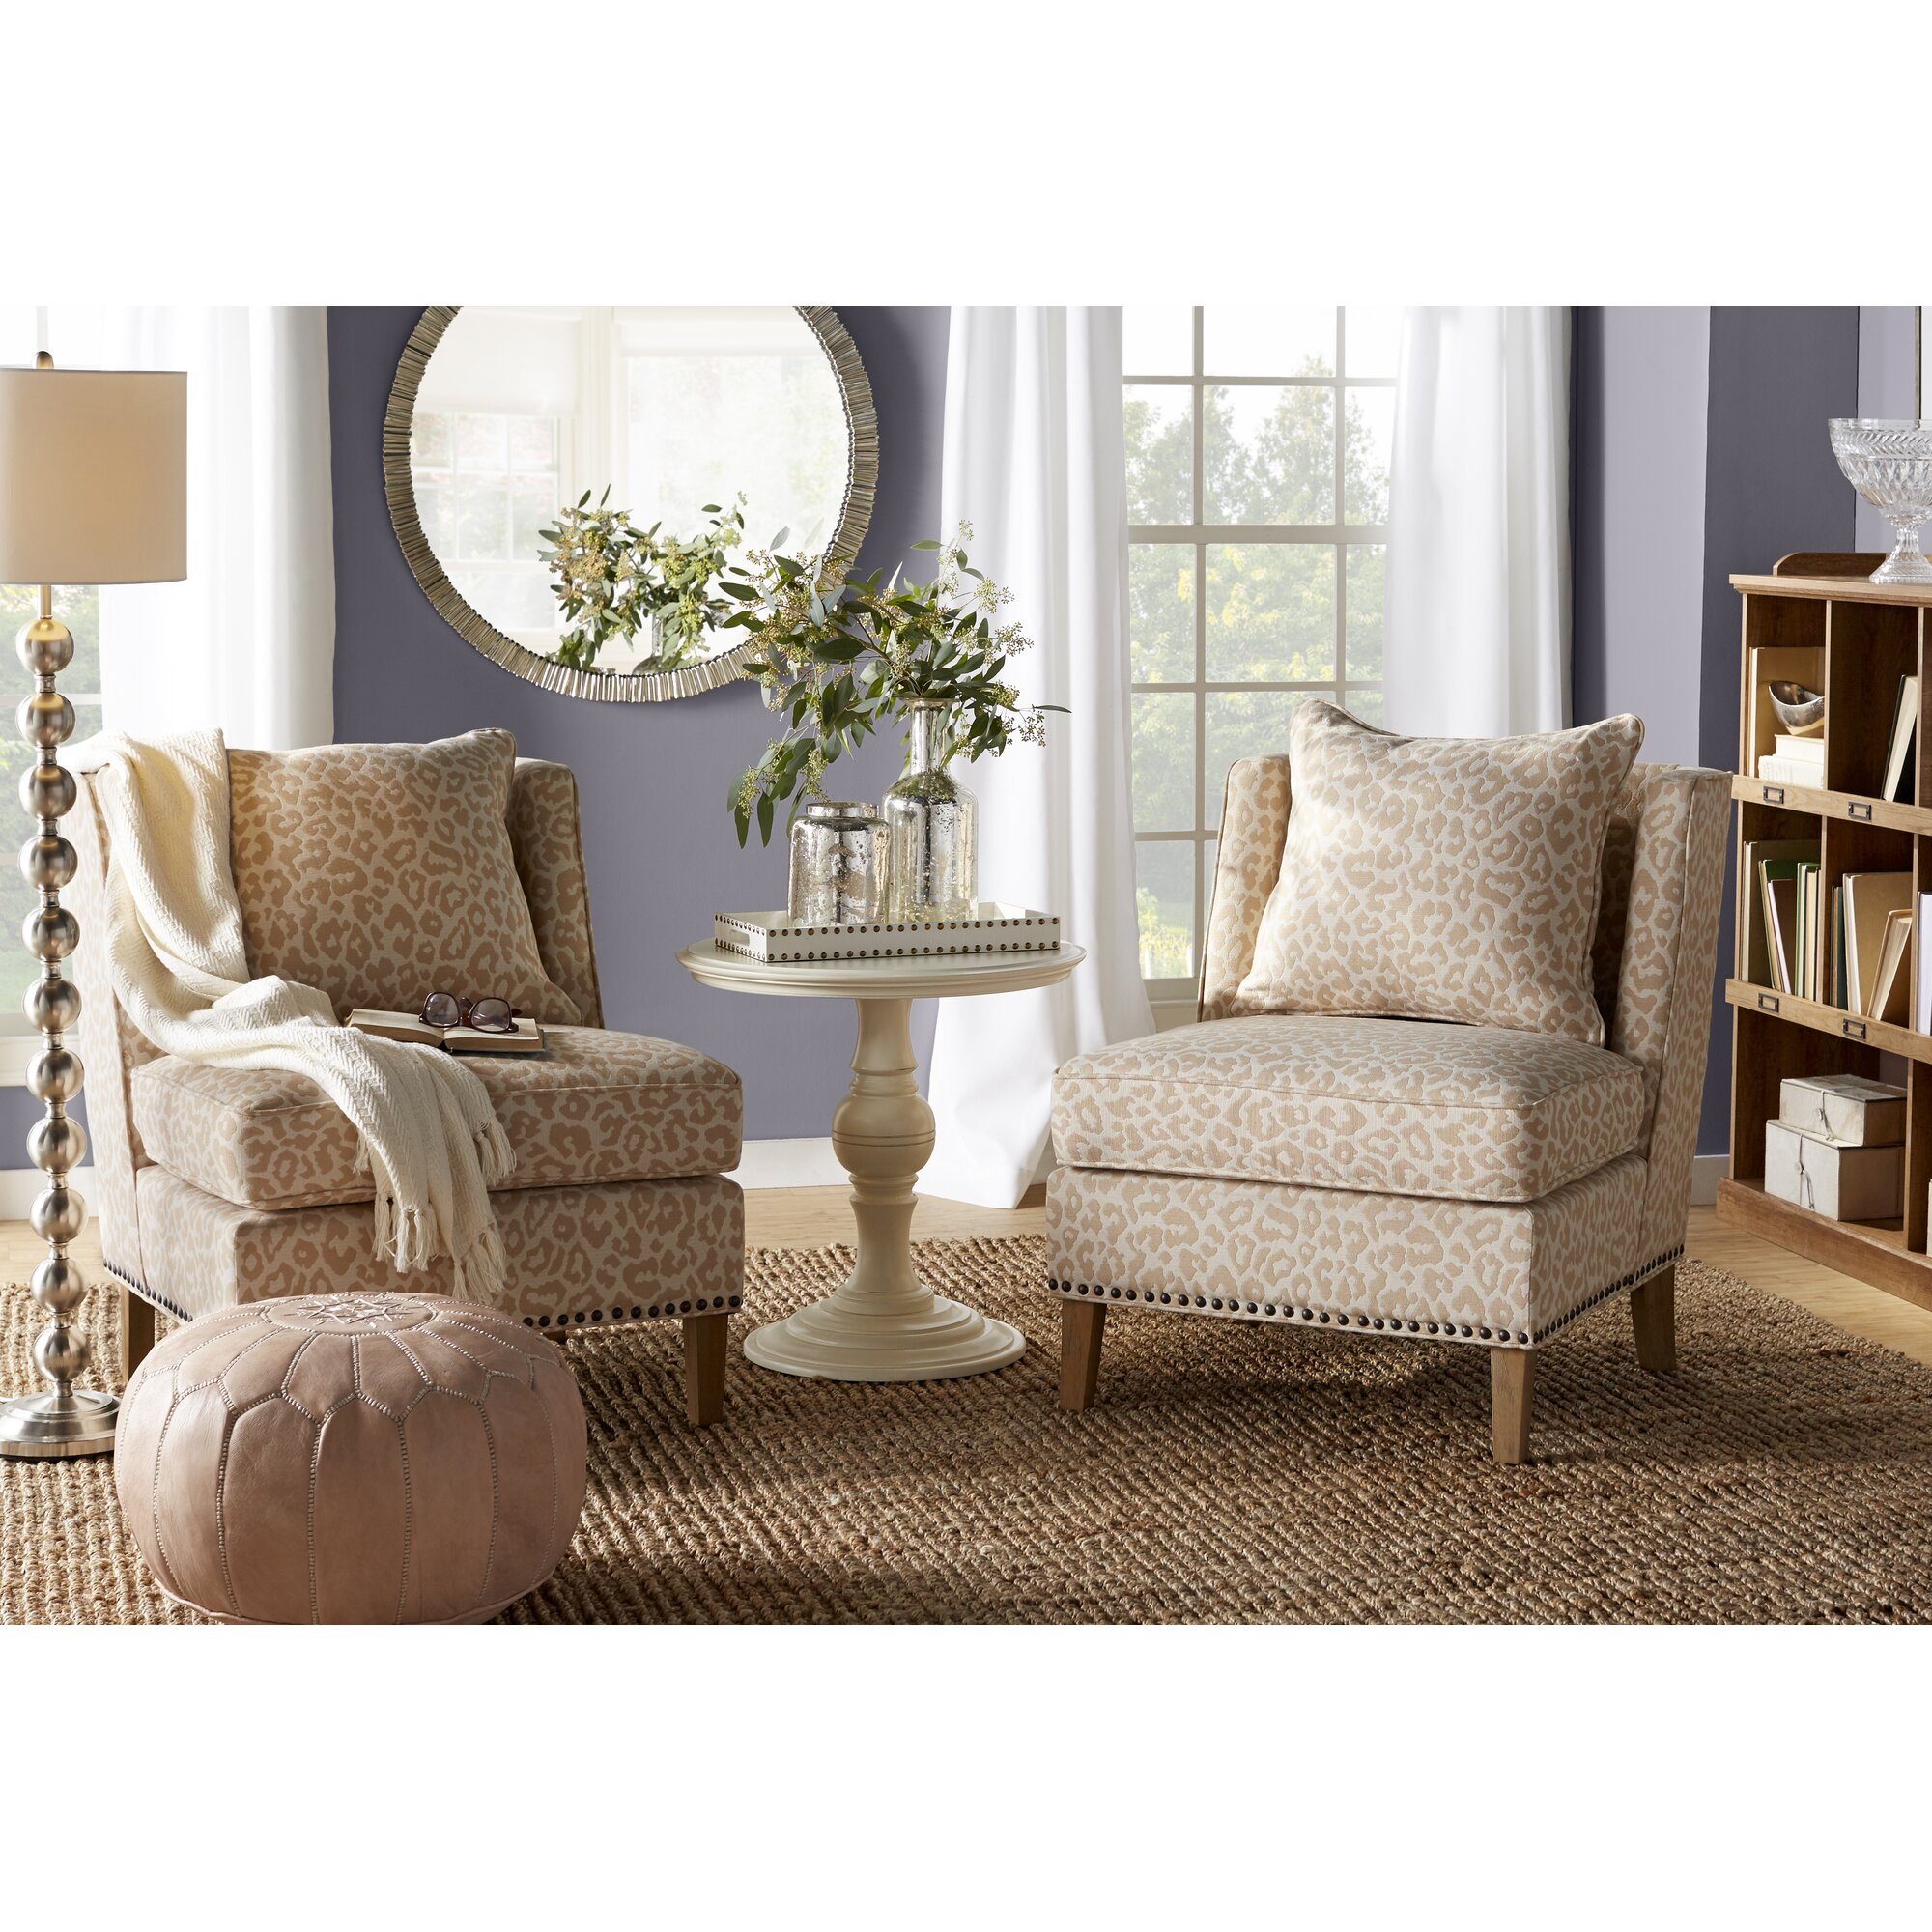 dexter slipper chair - Slipper Chairs